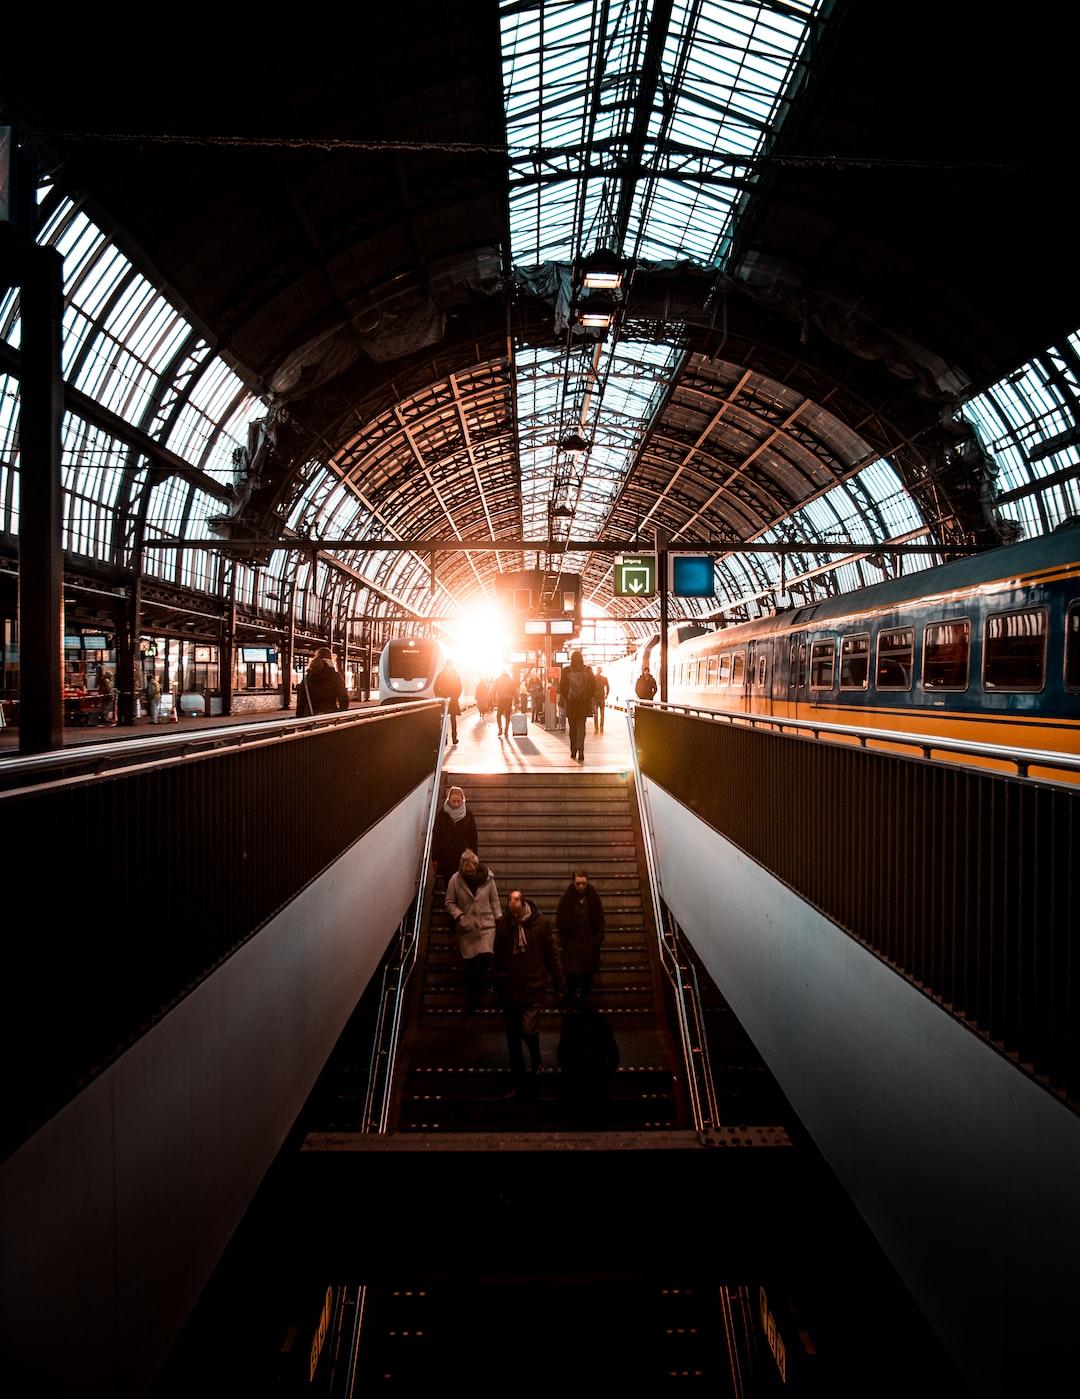 Sunset @ the Amsterdam Trainstation